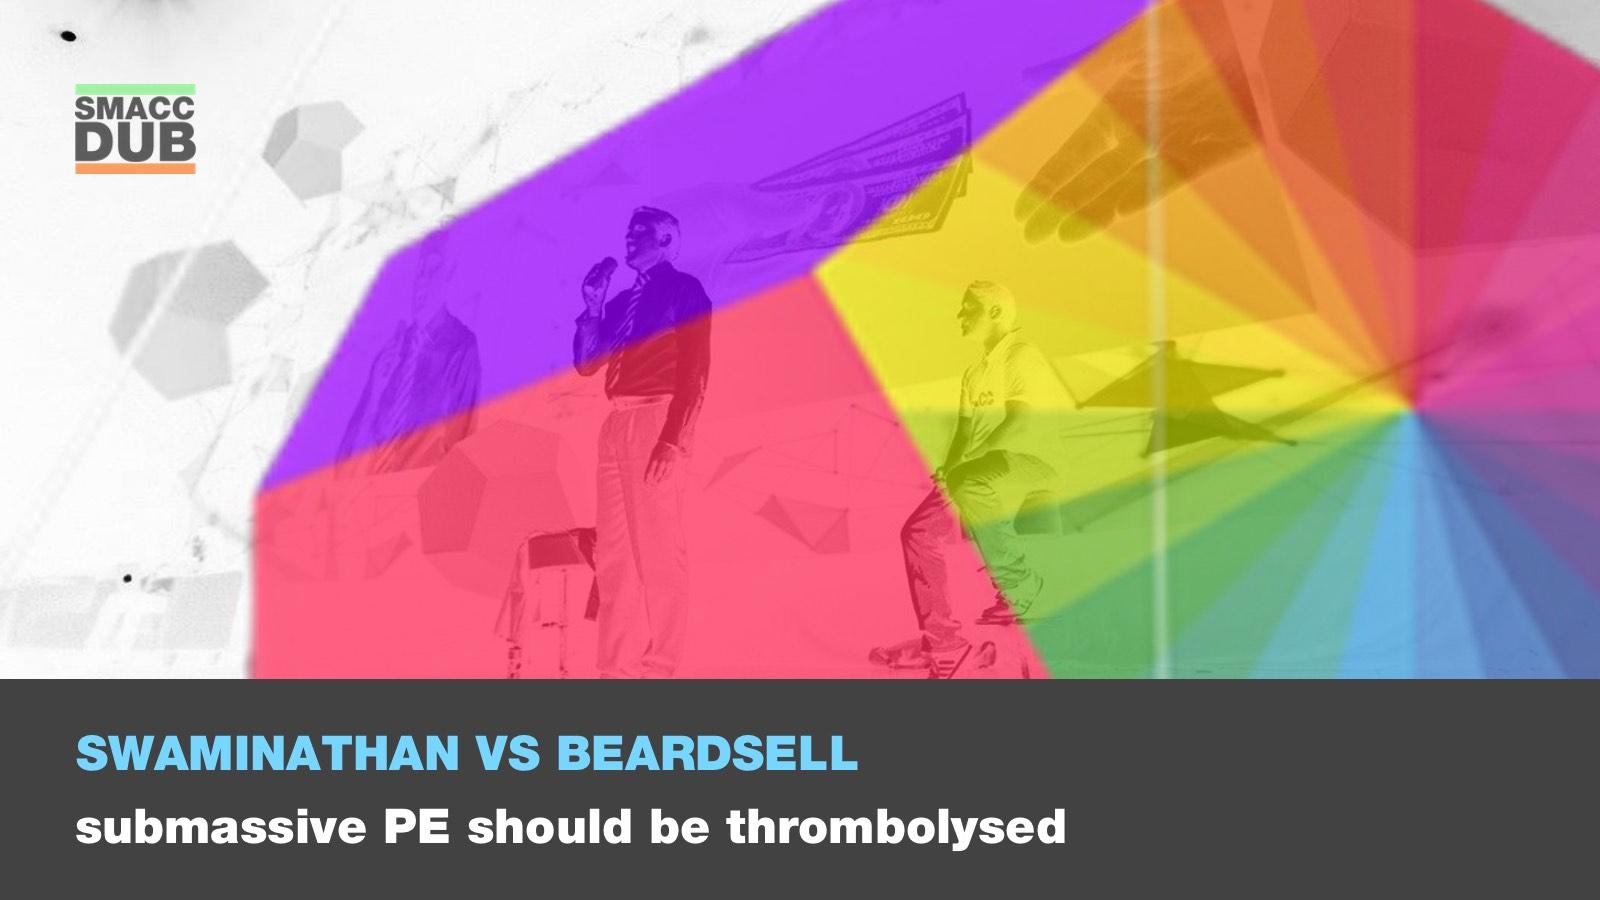 Beardsell Swami - Submassive PE should be thrombolysed